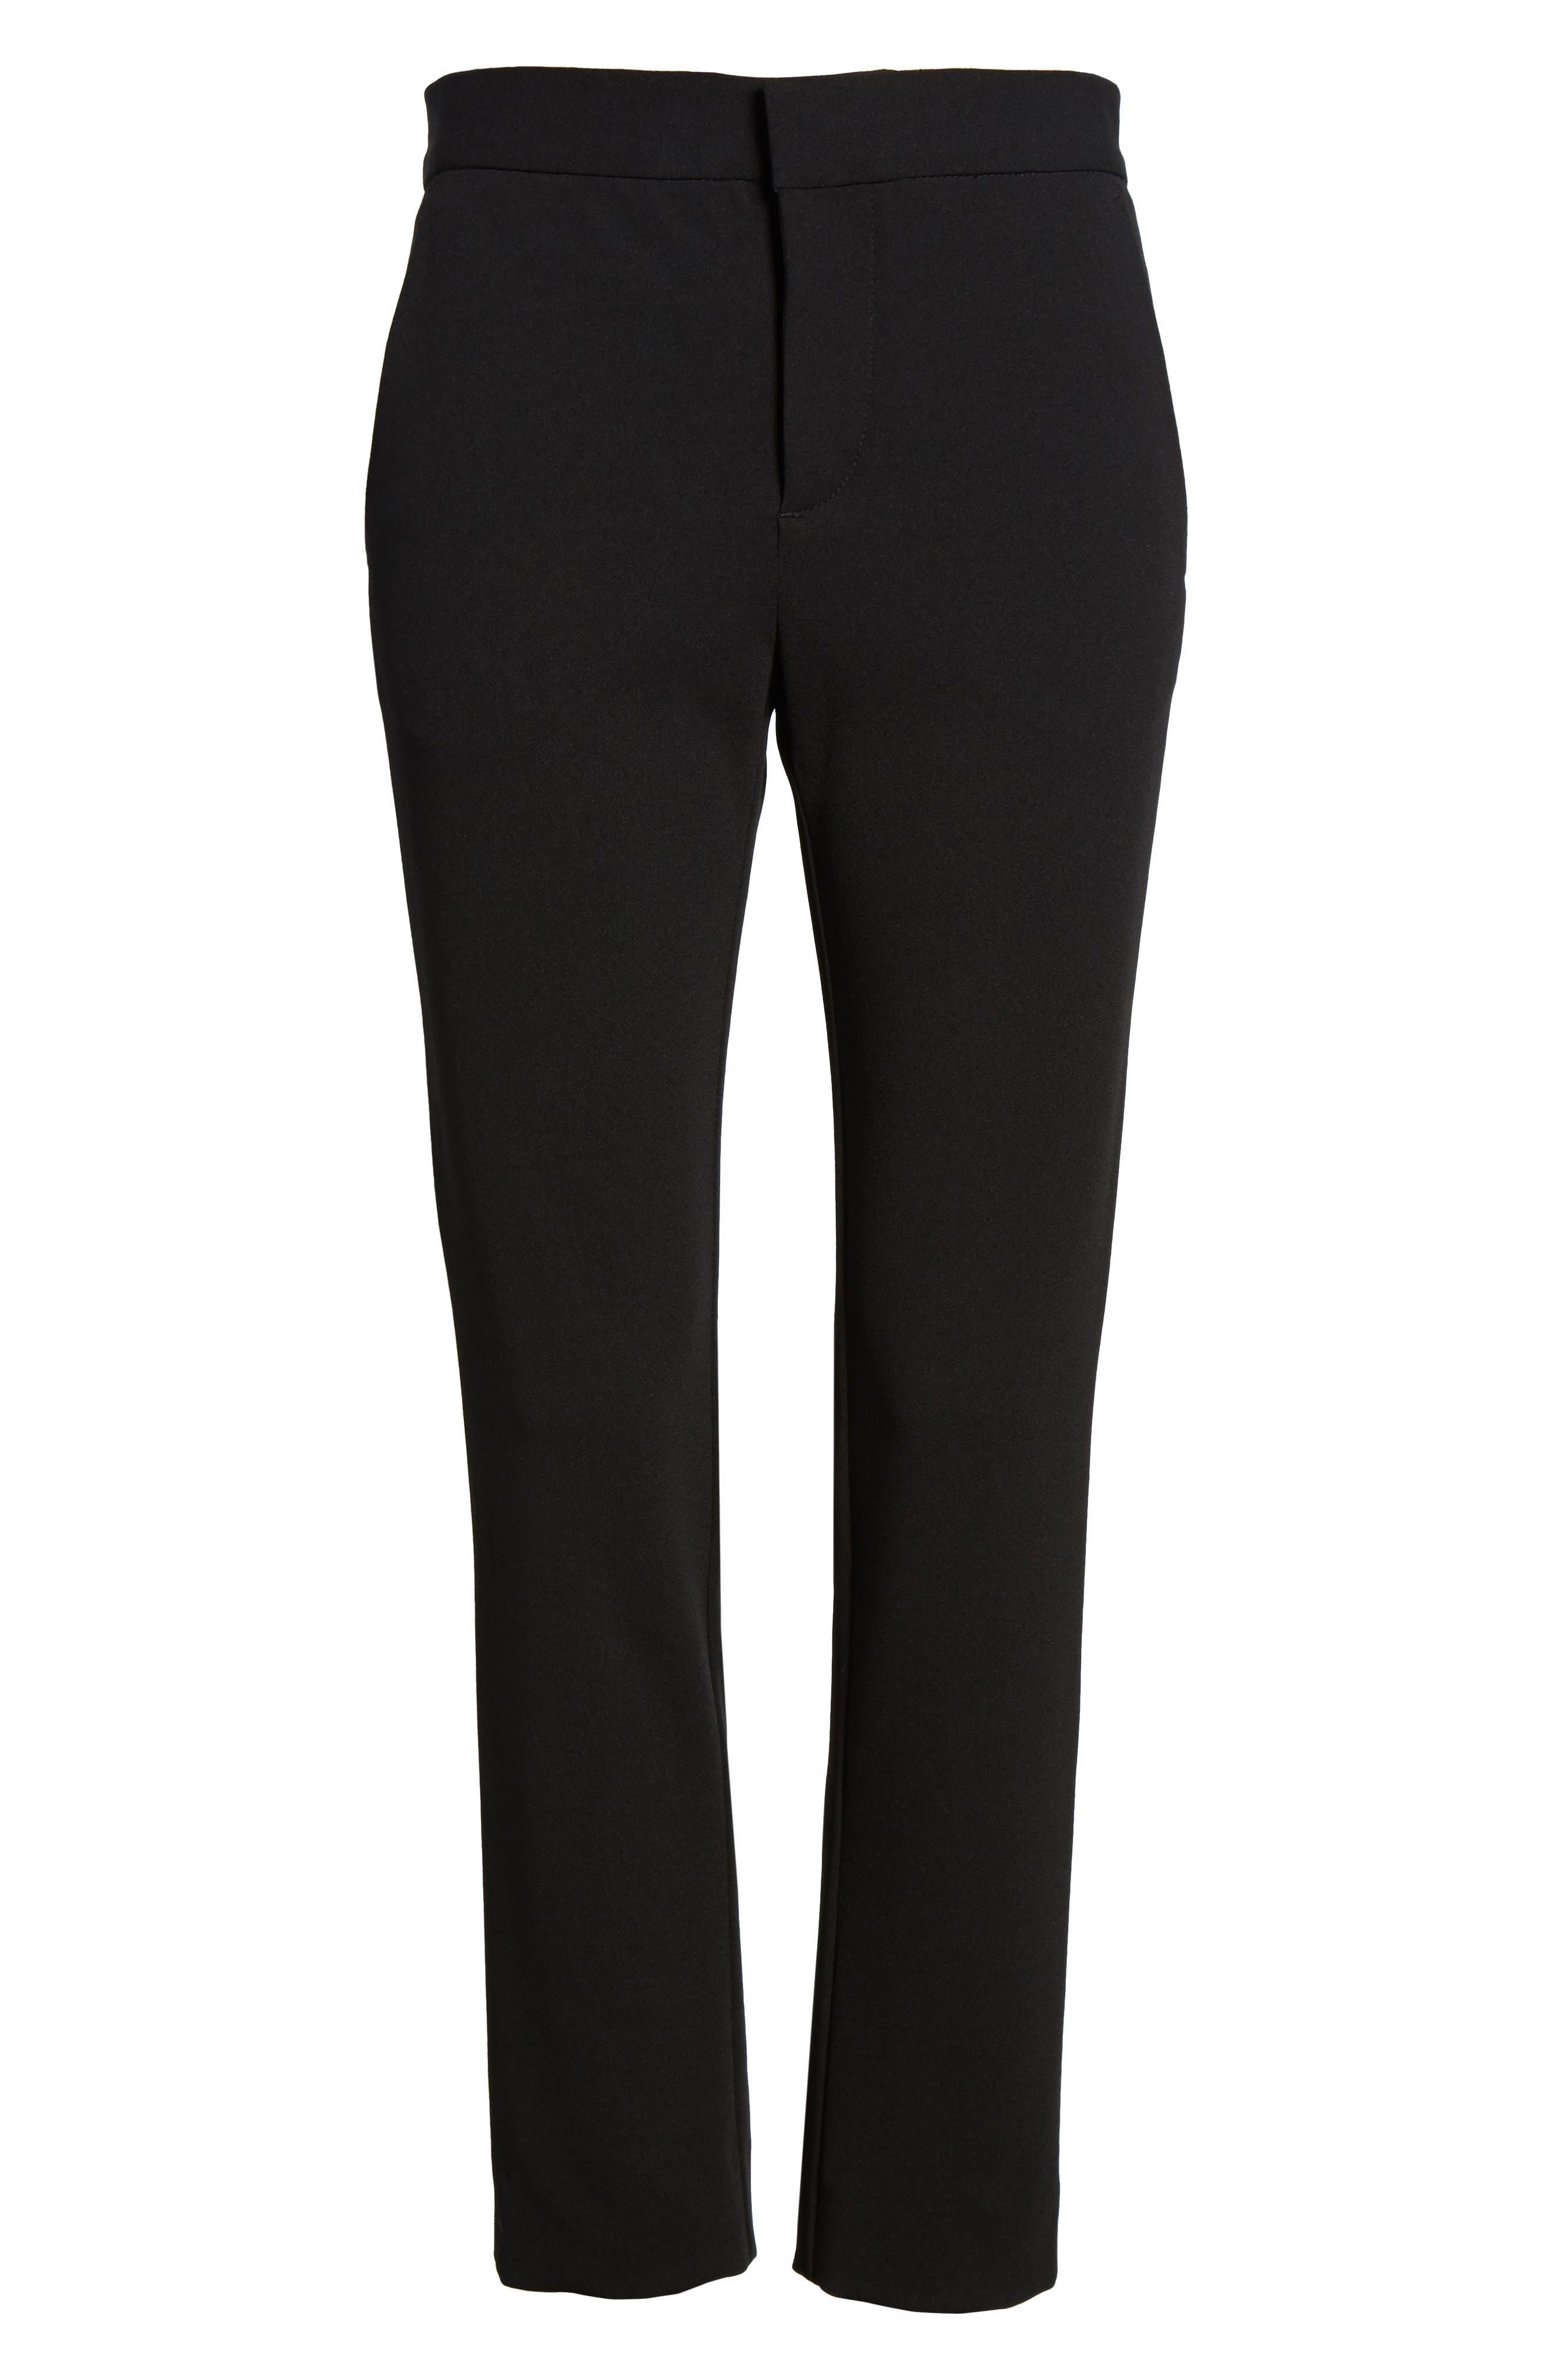 Lou Lou High Waist Crop Slim Trousers,                             Alternate thumbnail 6, color,                             001